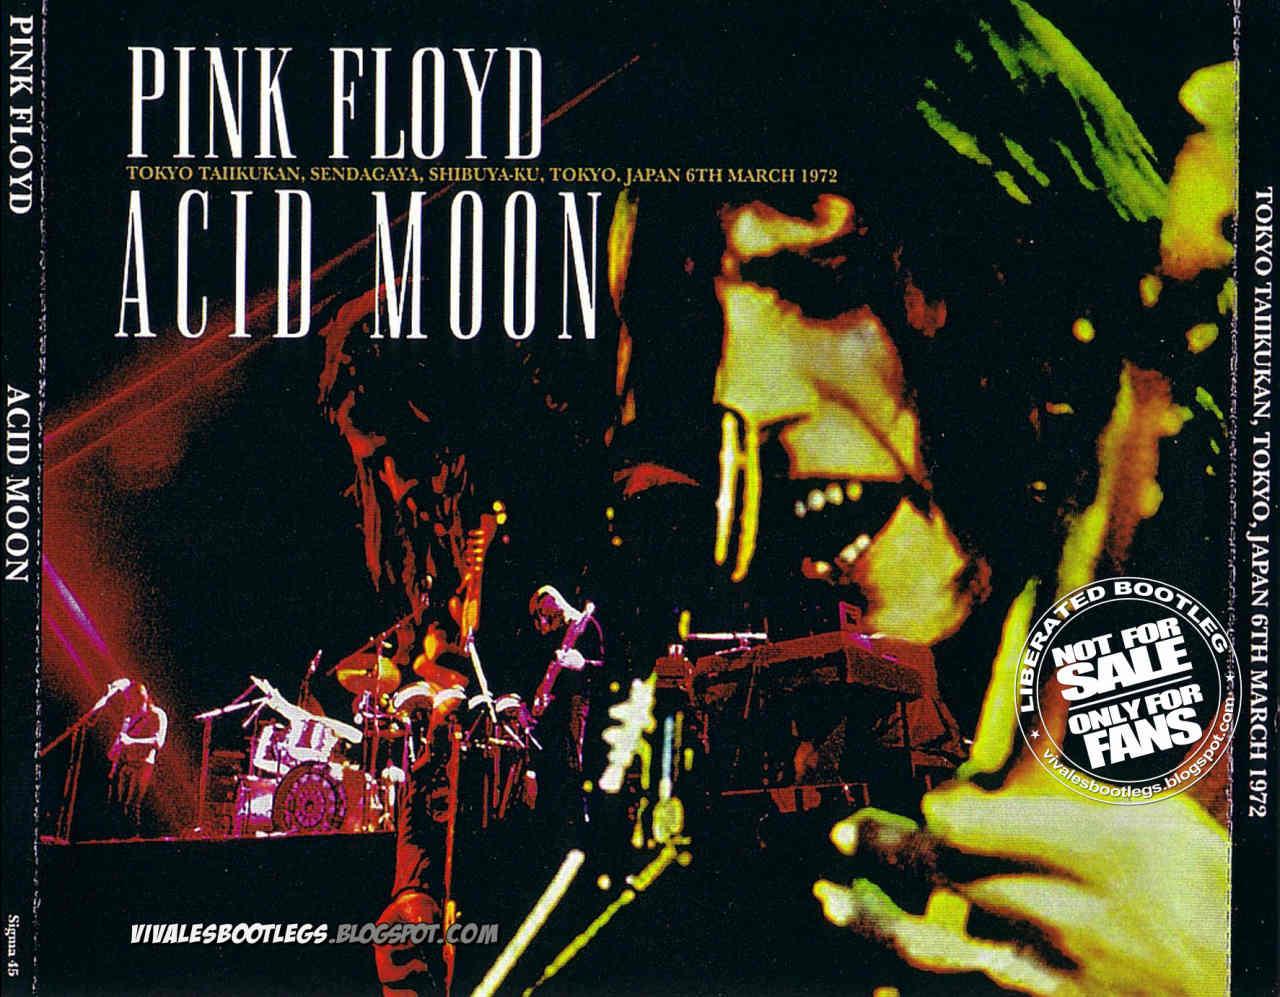 Pink Floyd Bootleg Download - wineenergy's diary